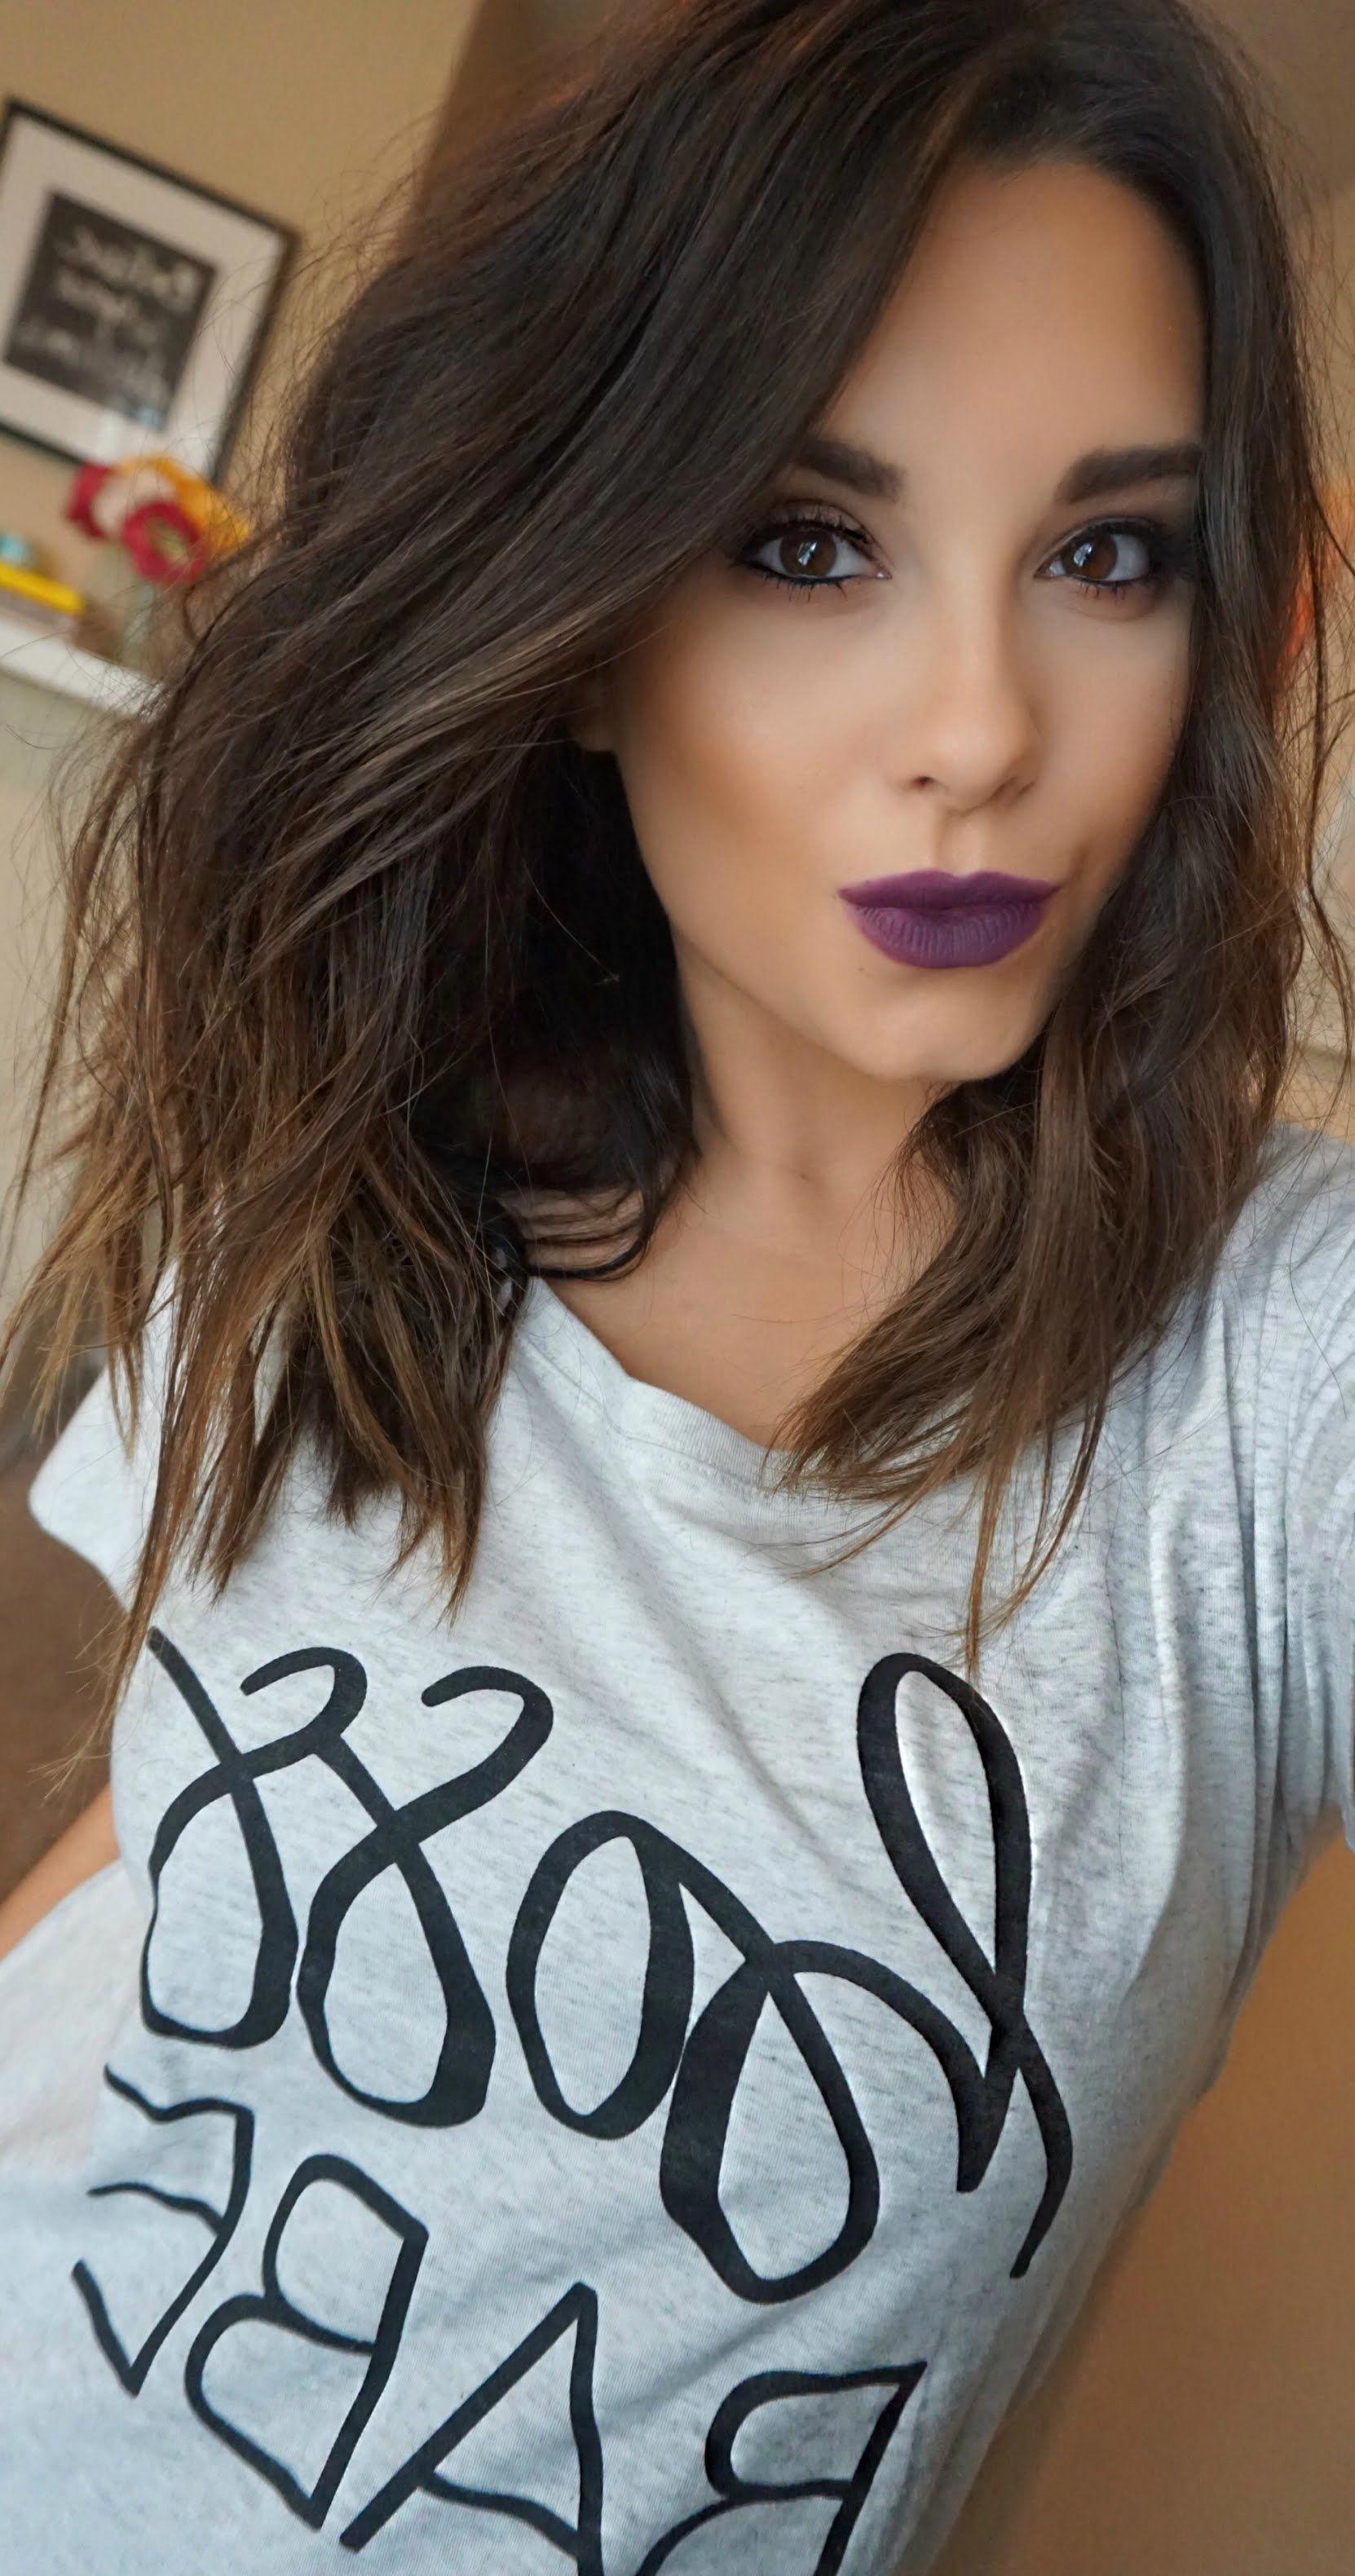 Hairfall and Beauty lip colors new photo